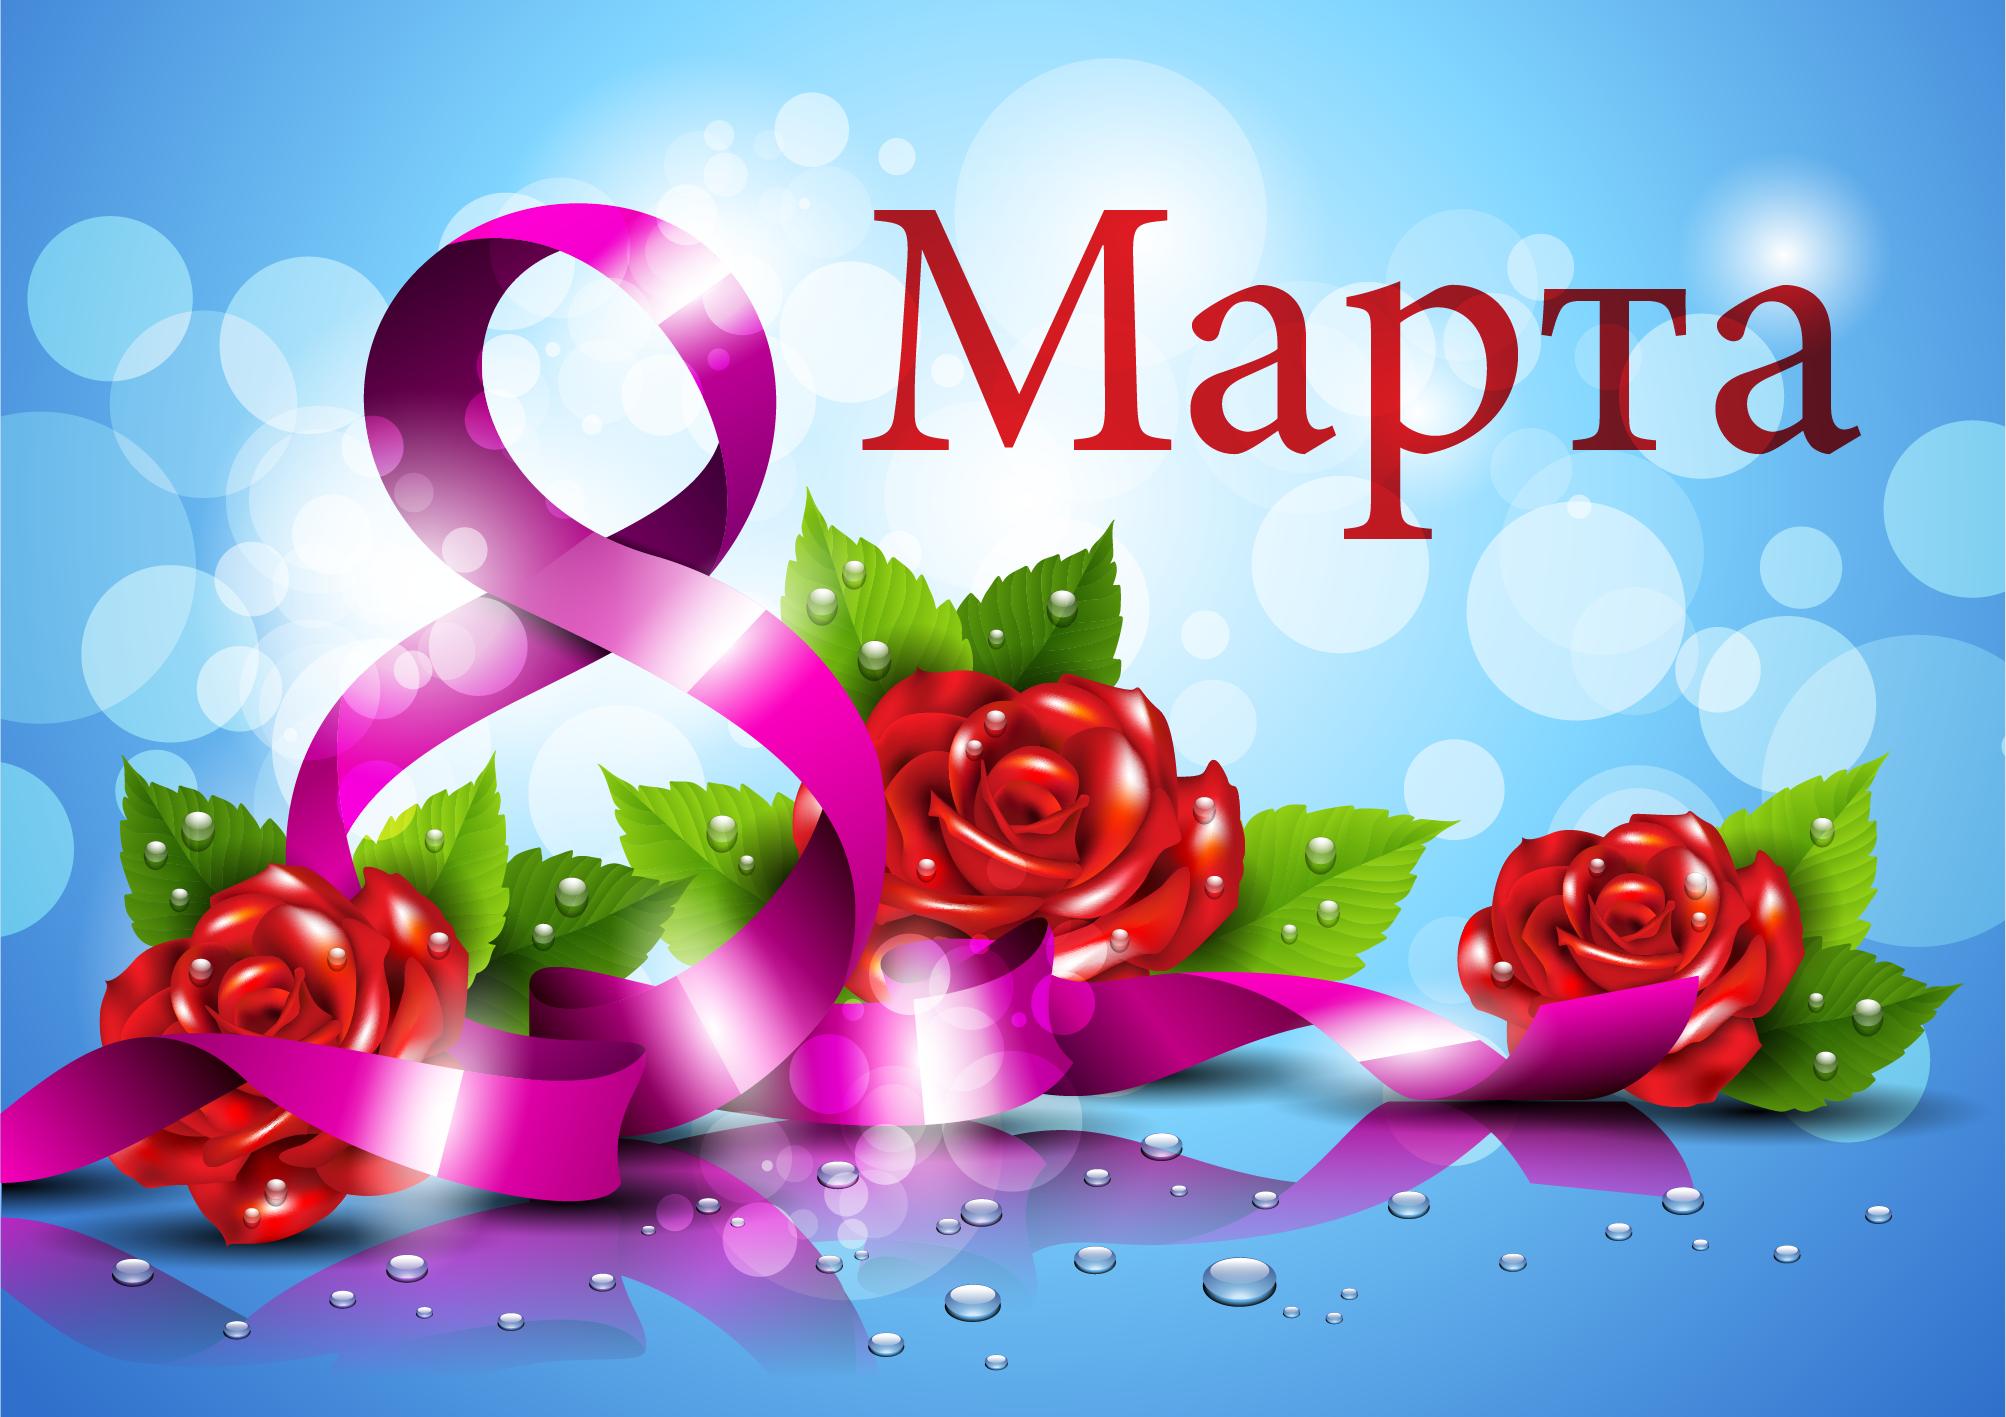 http://abali.ru/wp-content/uploads/2013/03/8_marta_otkrytka.png